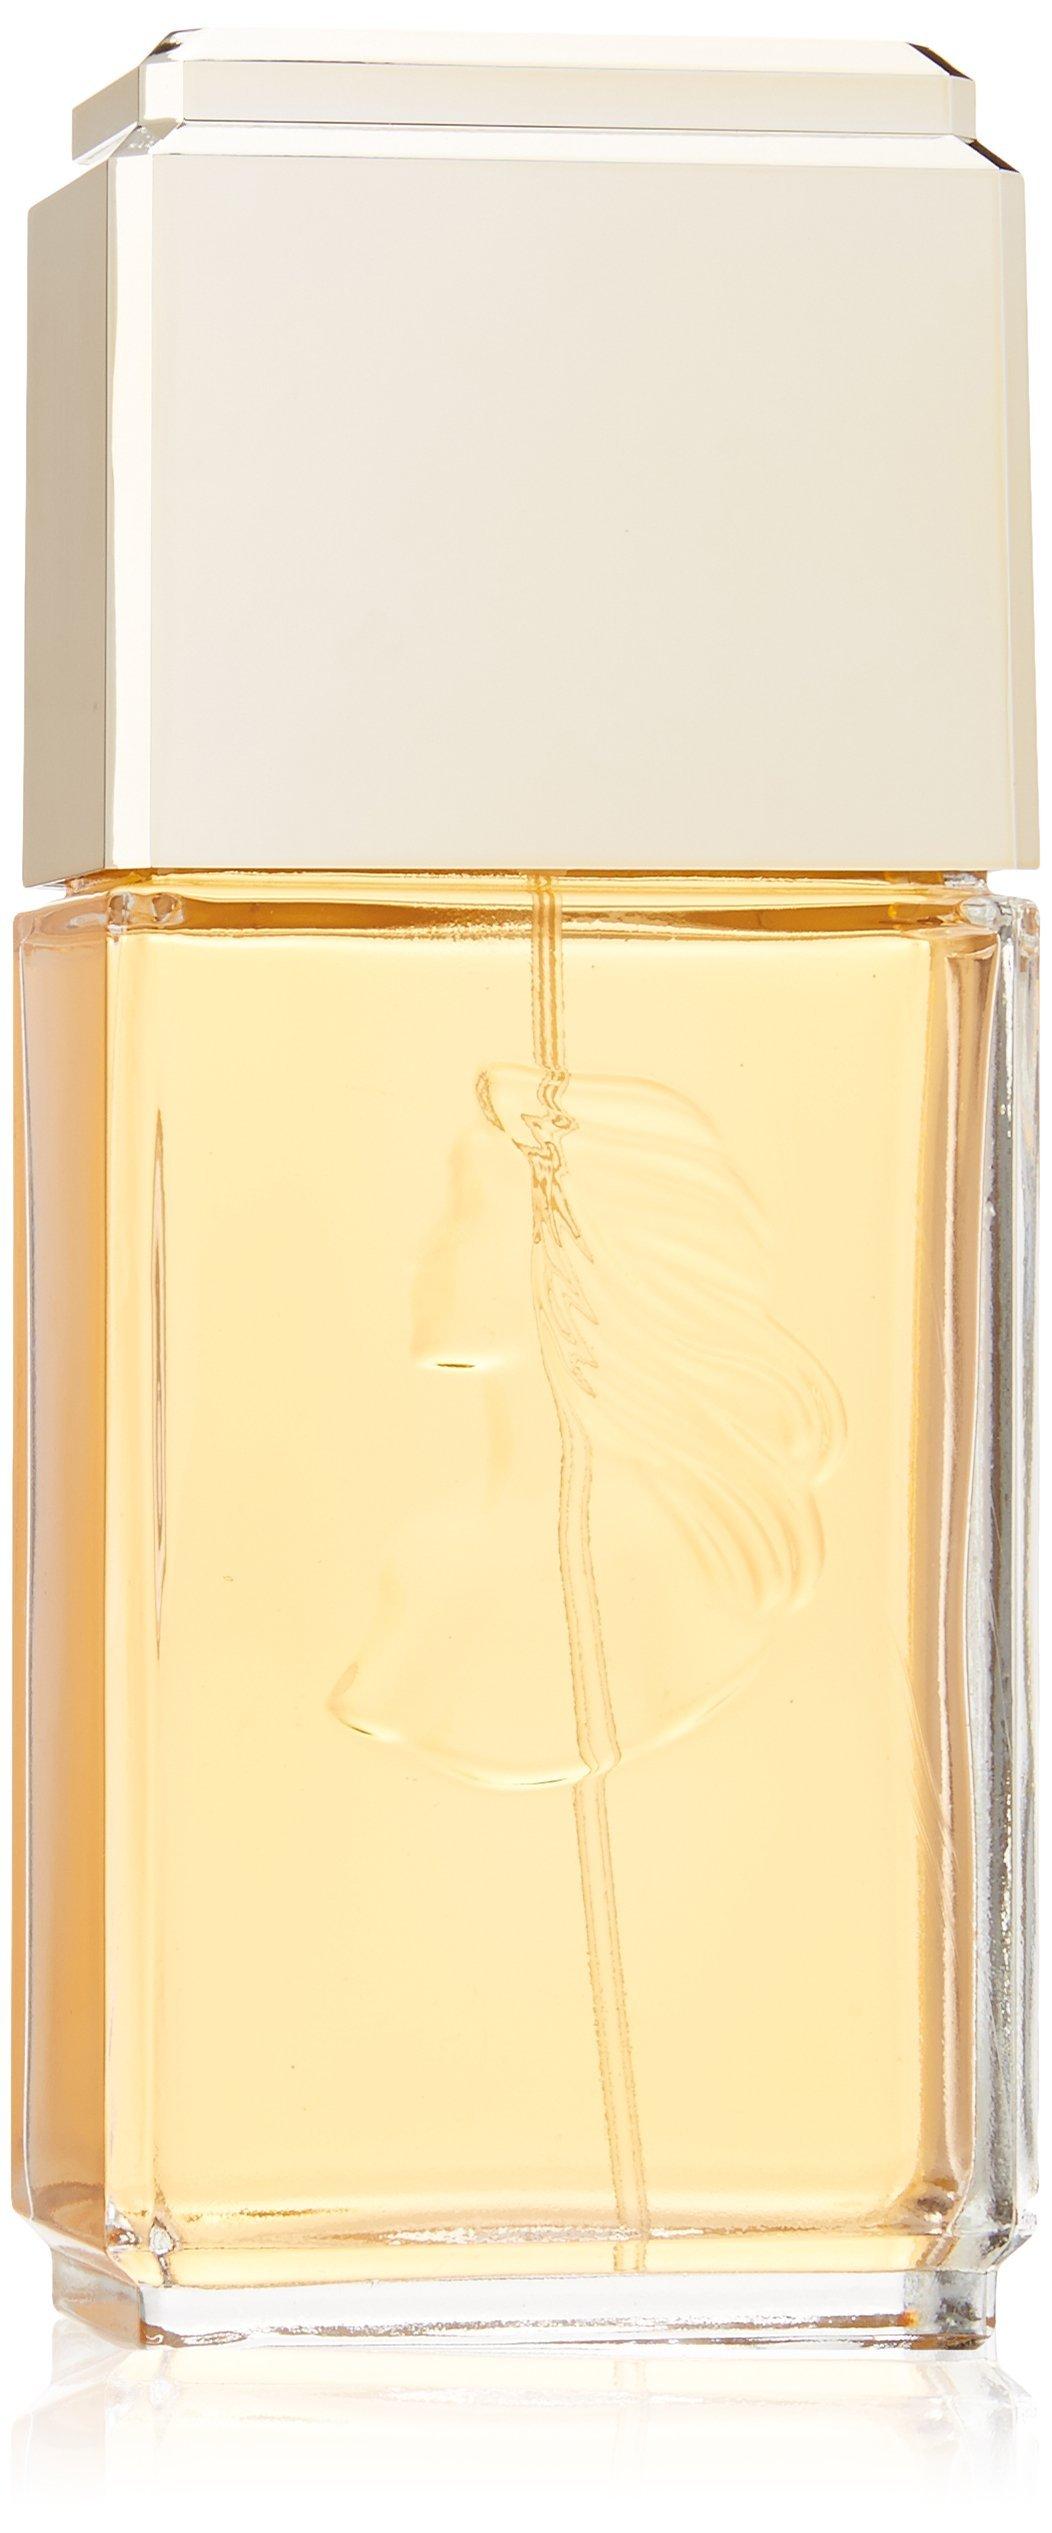 White Shoulders By Evyan For Women, Eau De Cologne Spray (4.5 Ounces) by Evyan